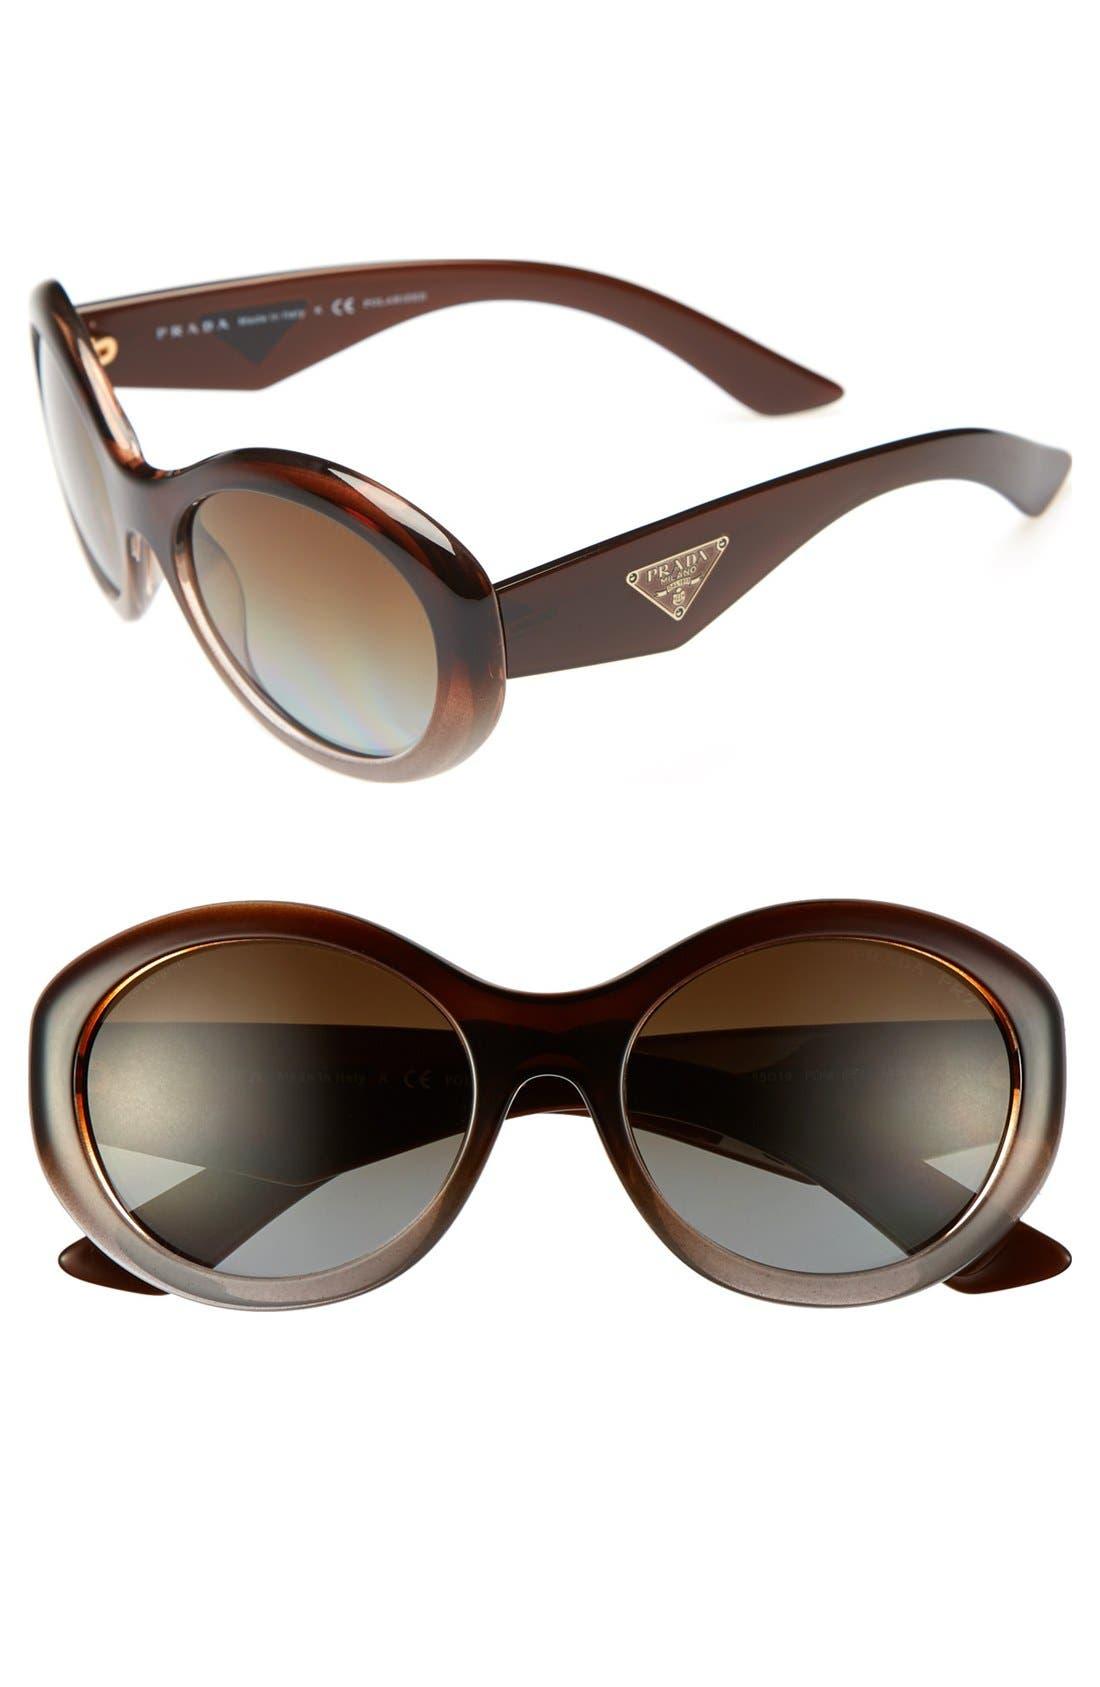 Alternate Image 1 Selected - Prada 'Oval Glam' 55mm Polarized Sunglasses